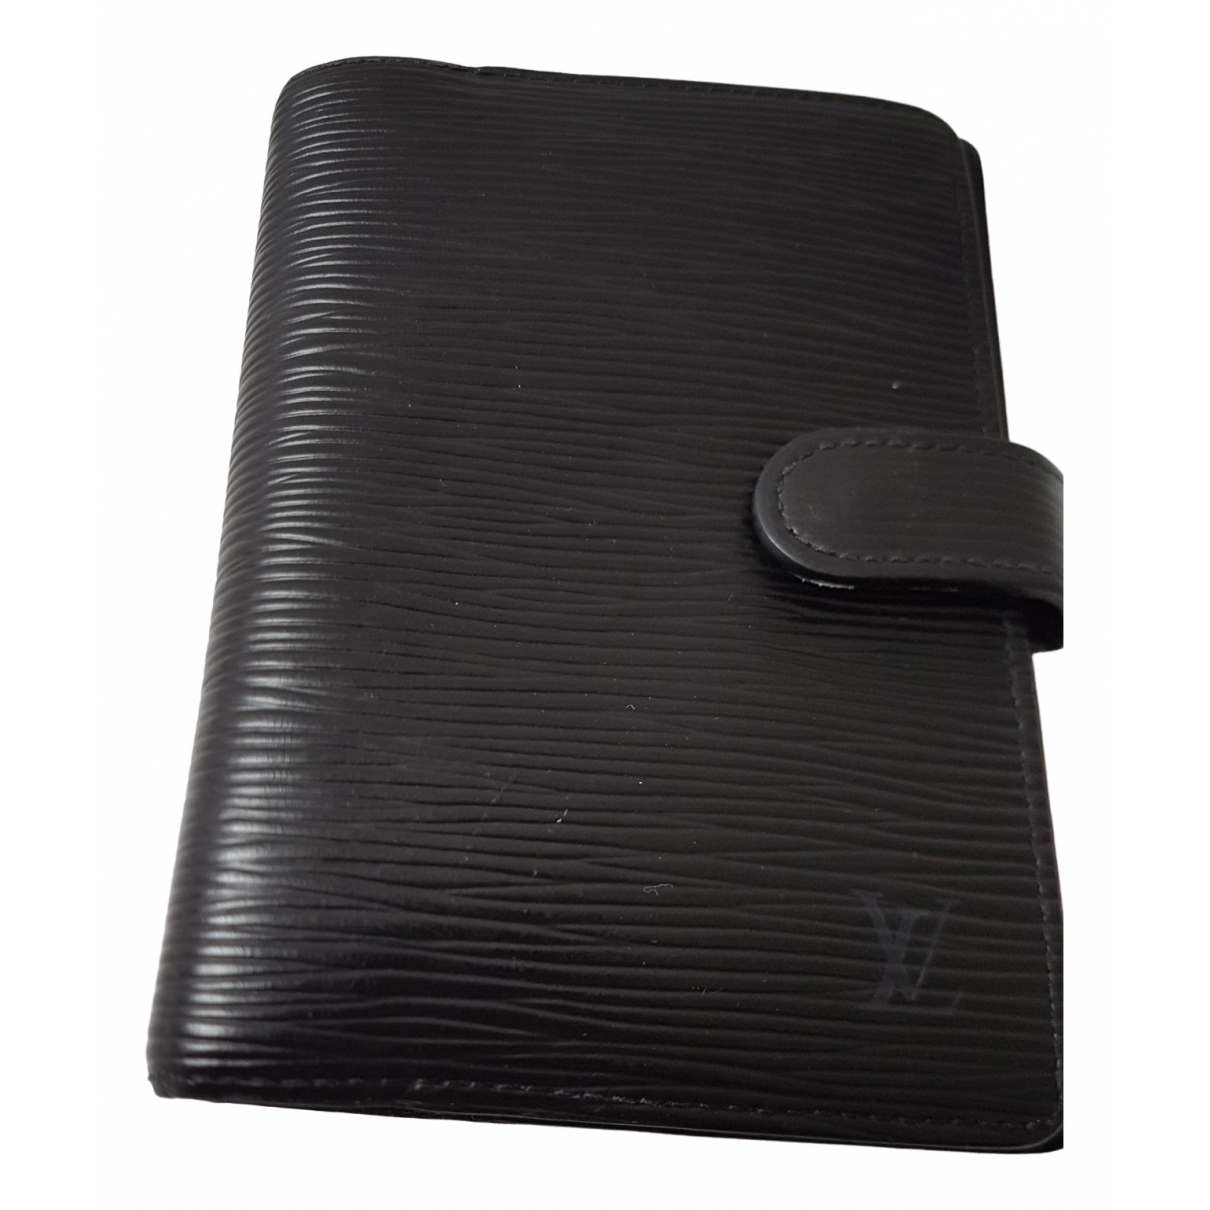 Agenda de Cuero Louis Vuitton